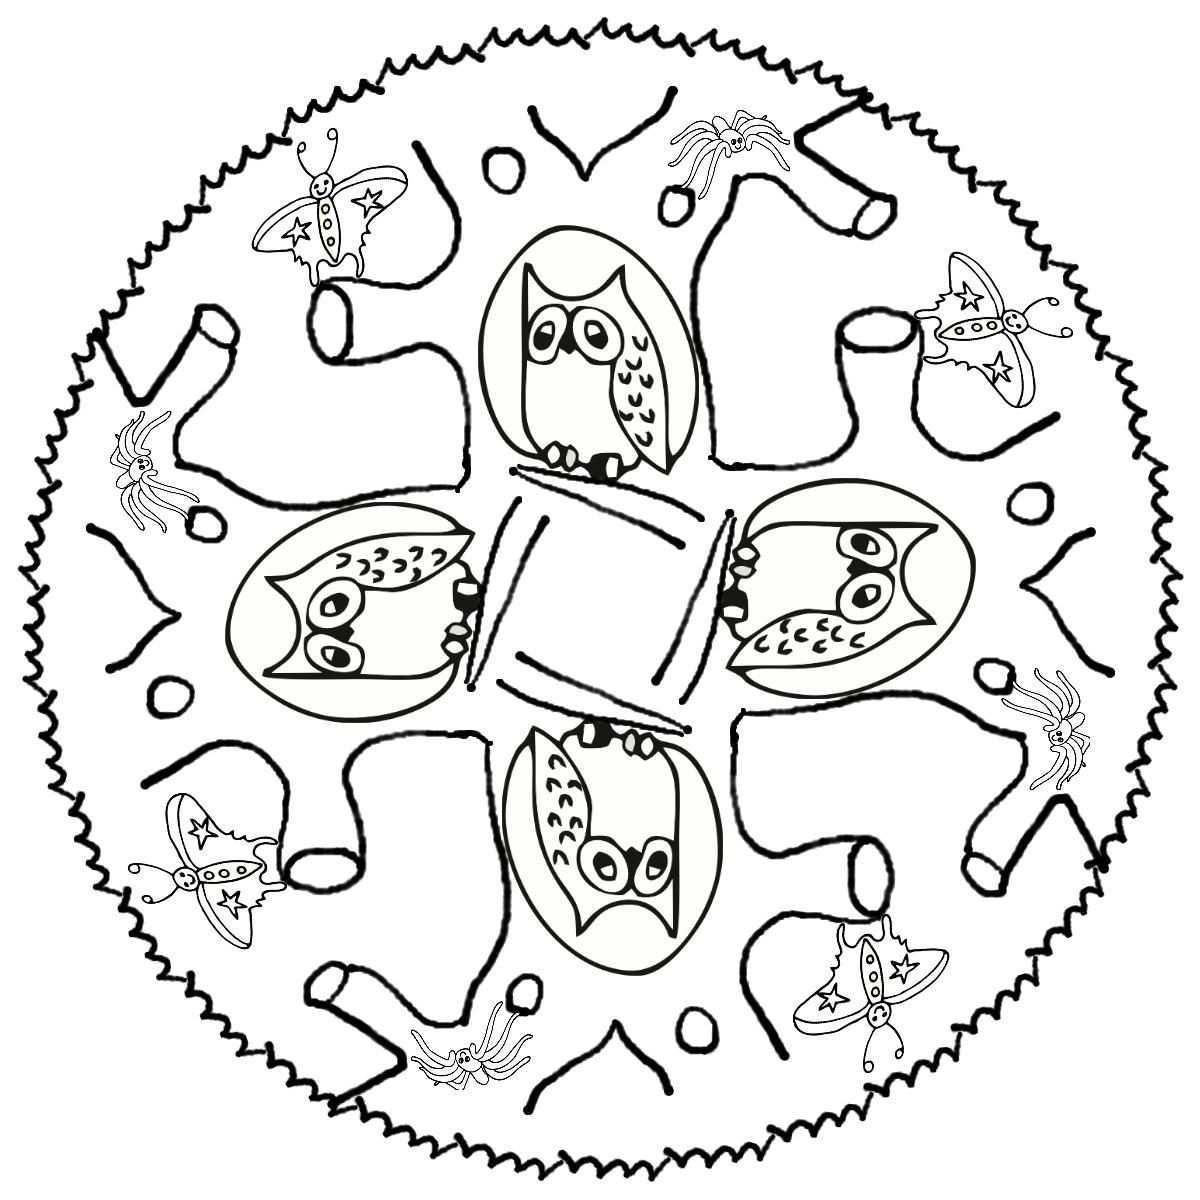 Mandala Uiltjes Mandala Tiere Ausmalbilder Eulen Ausmalbilder